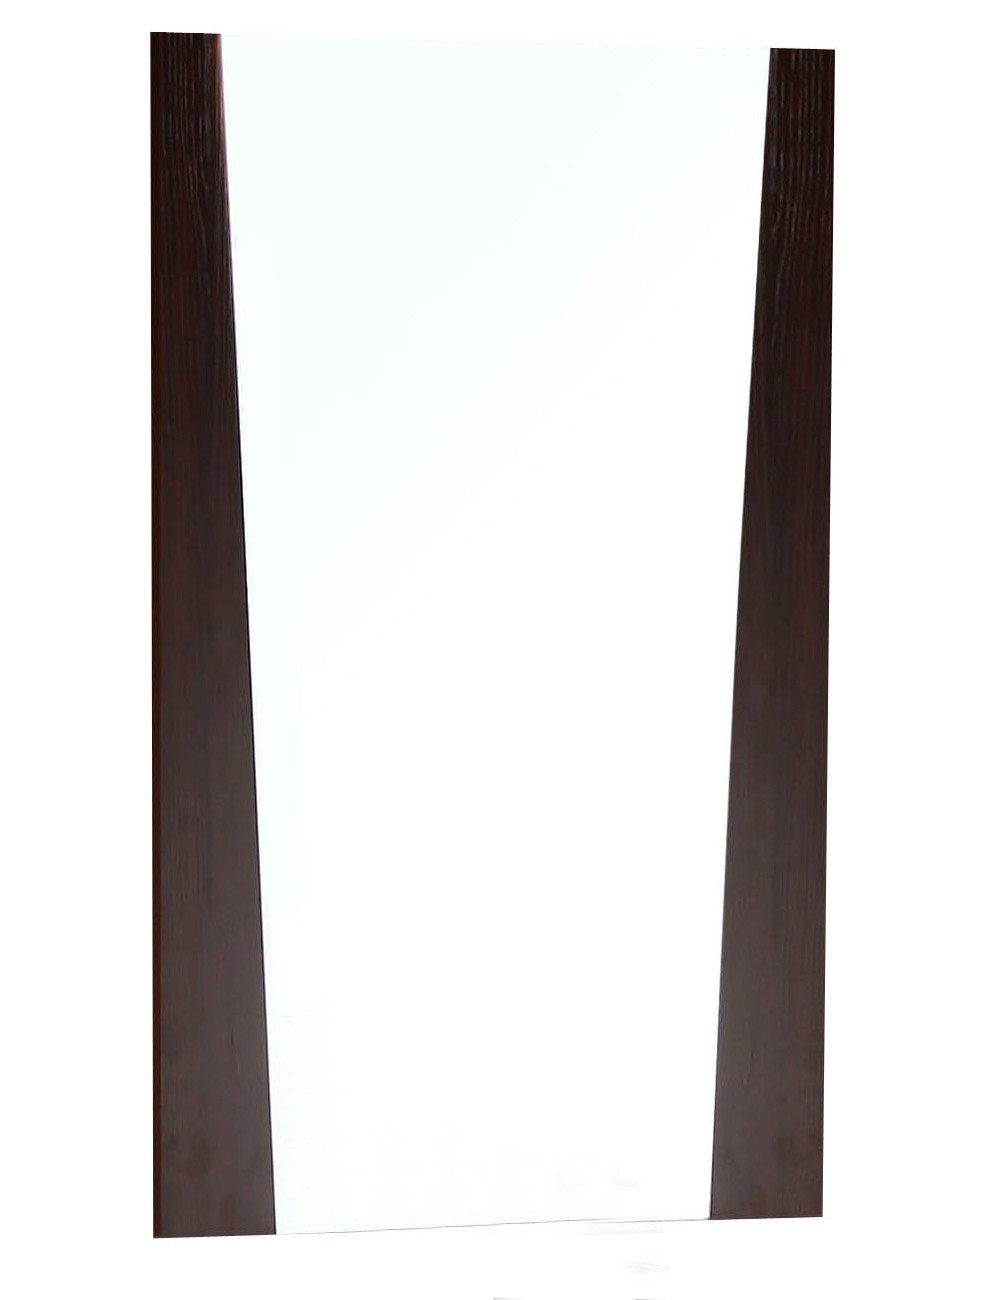 American Imaginations AI-3-1208 Modern Plywood-Melamine Wood Mirror, 24-Inch x 34-Inch, Wenge Finish